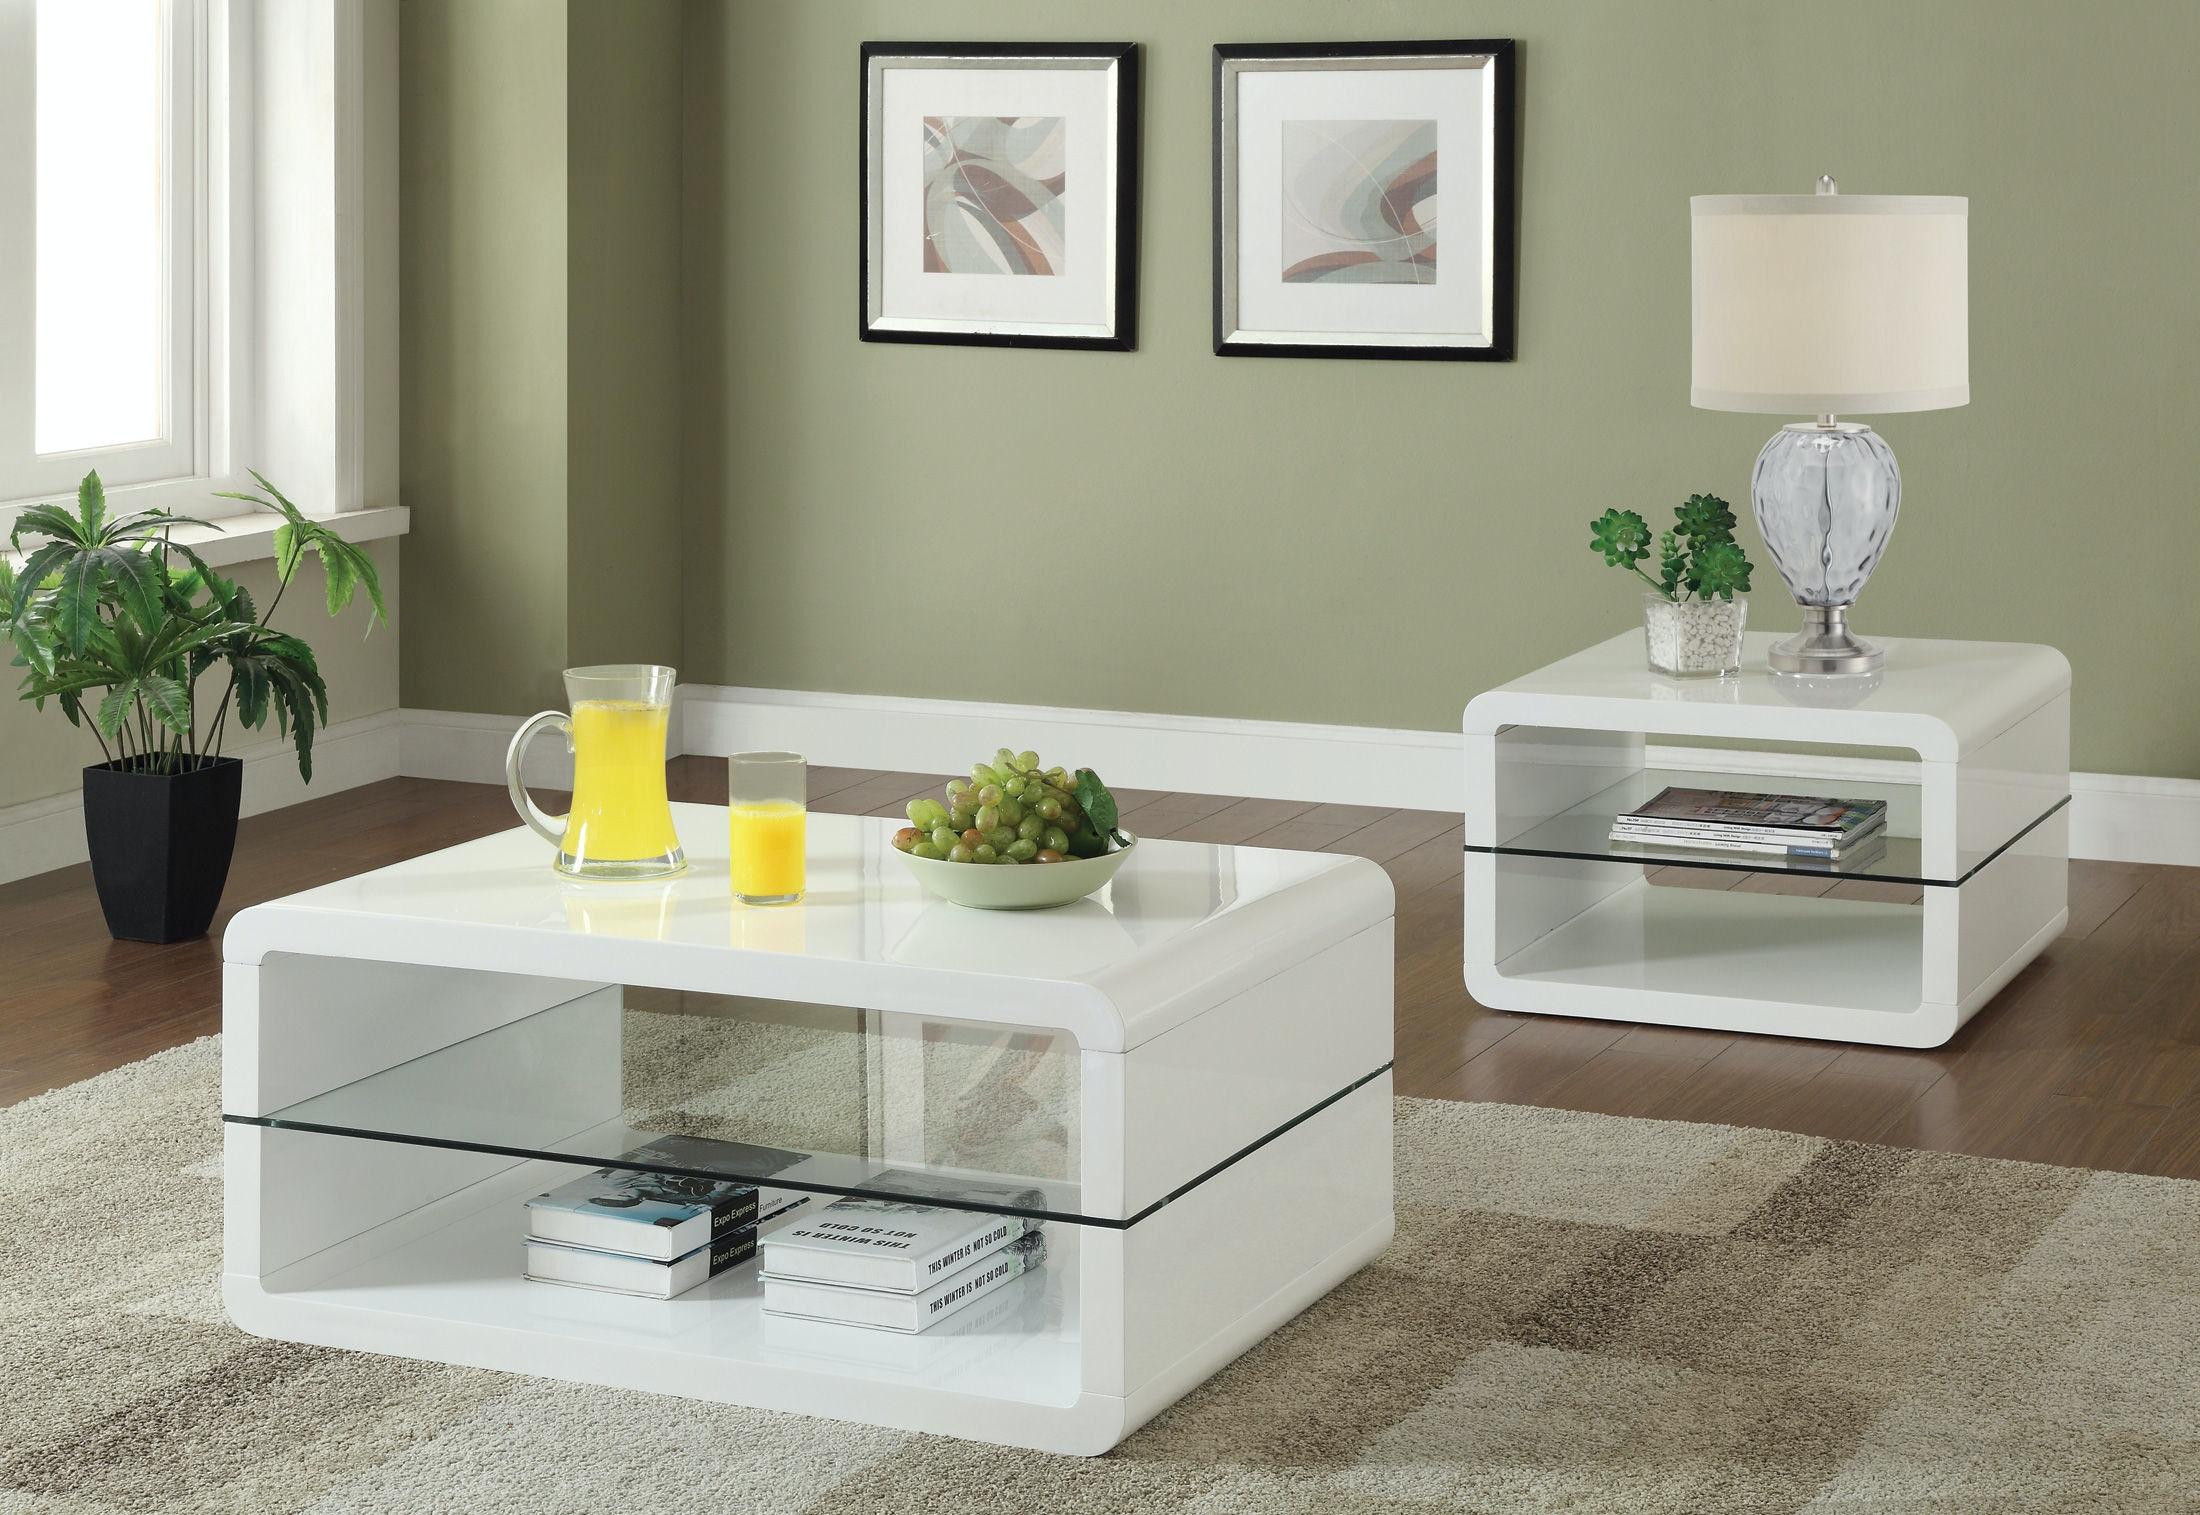 Factory Direct Furniture Hutchinson Mn Dustytrailbookscom